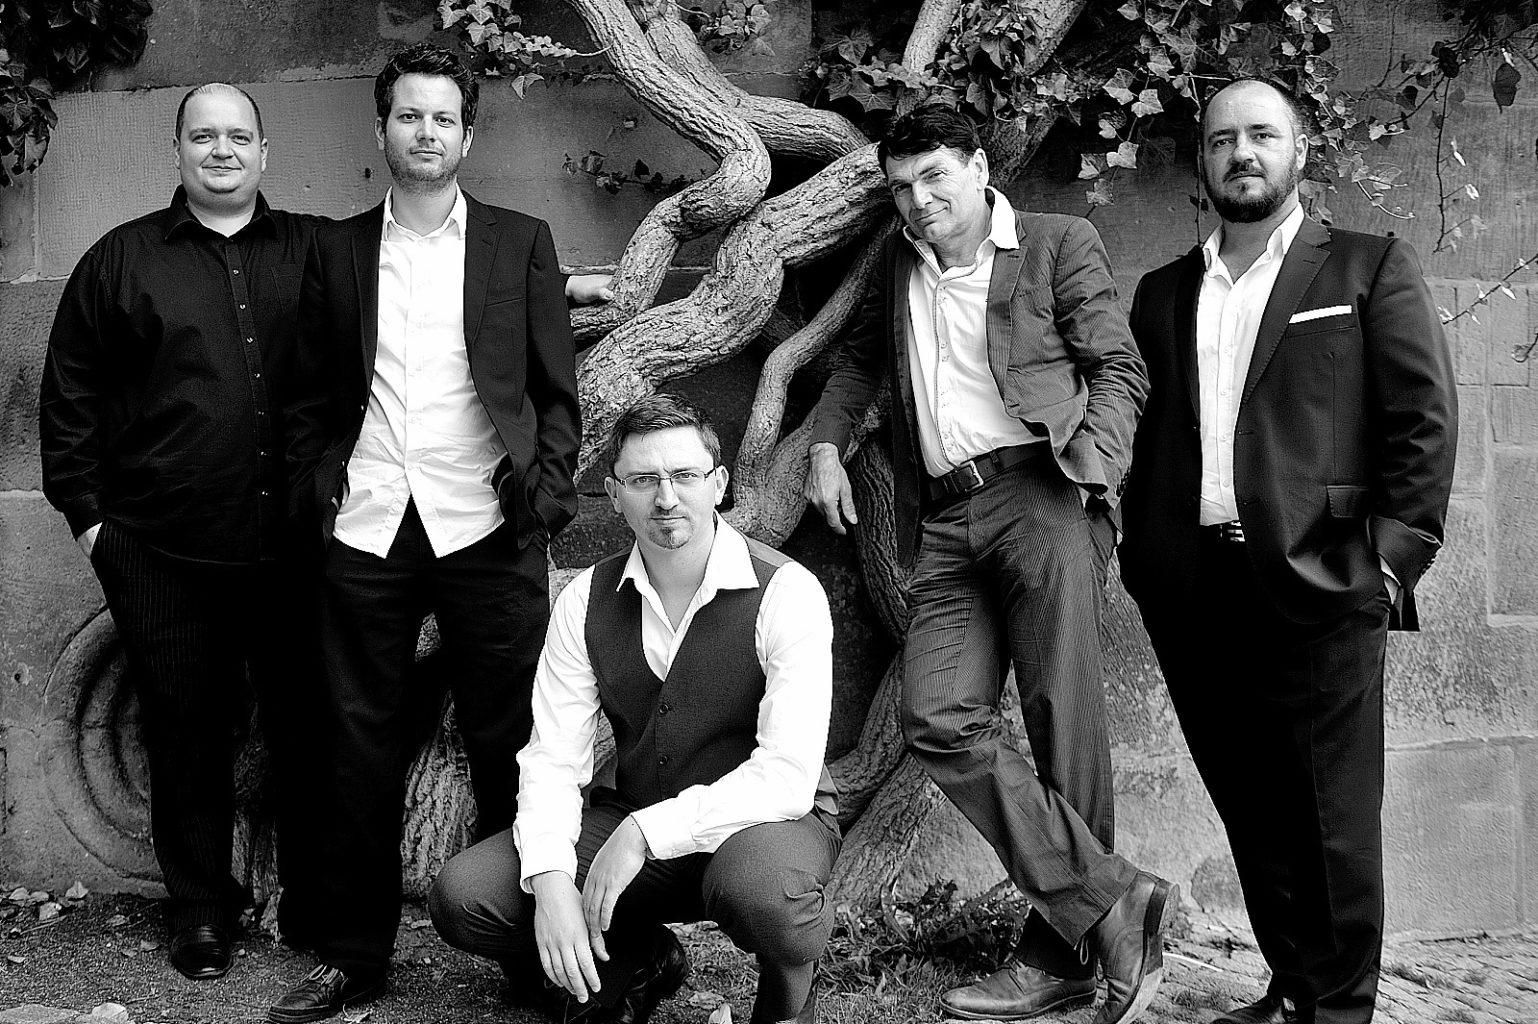 10-05-2014 Gutenbergbrothers Band Fotos 270